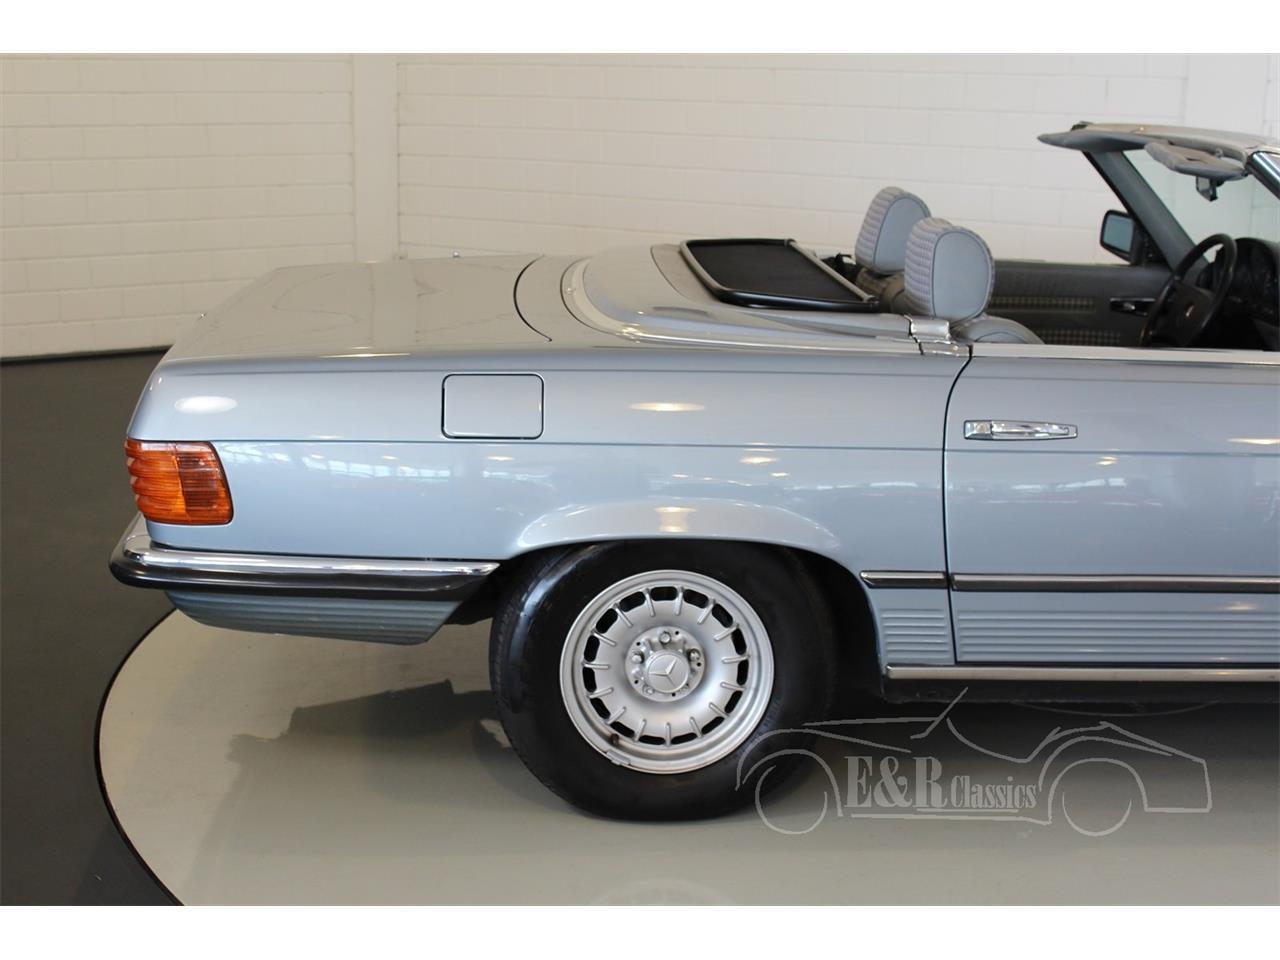 Large Picture of '83 Mercedes-Benz 280SL - $34,150.00 - QEBS